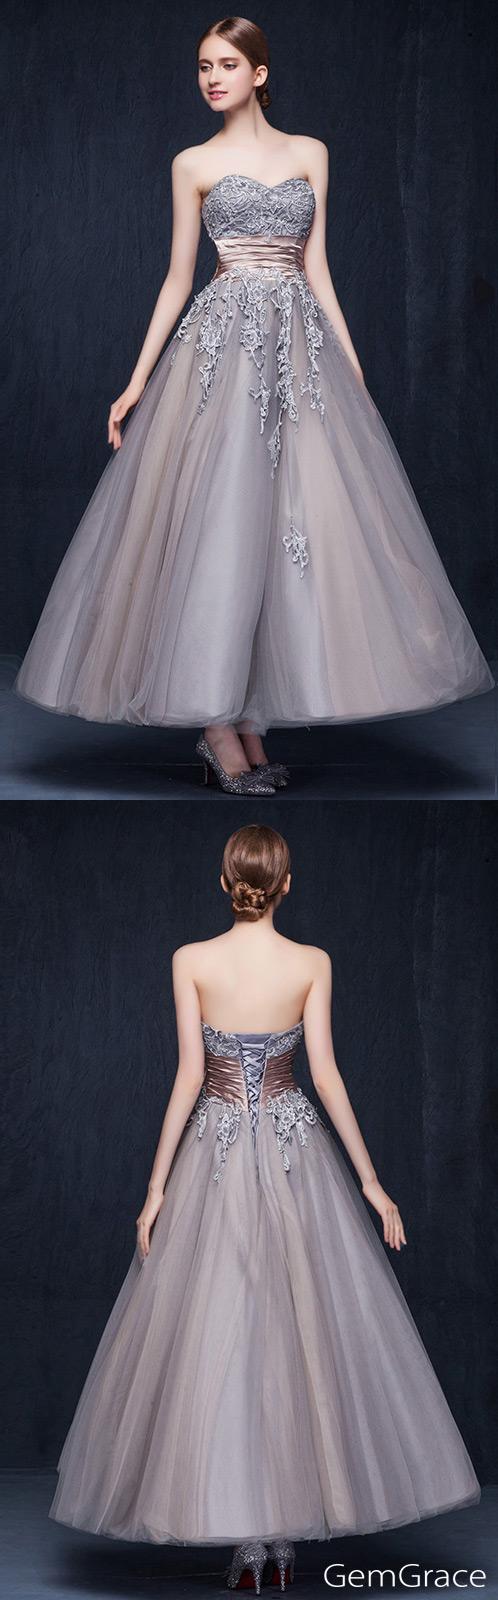 Vintage tulle ankle length wedding dresses retro wedding a line